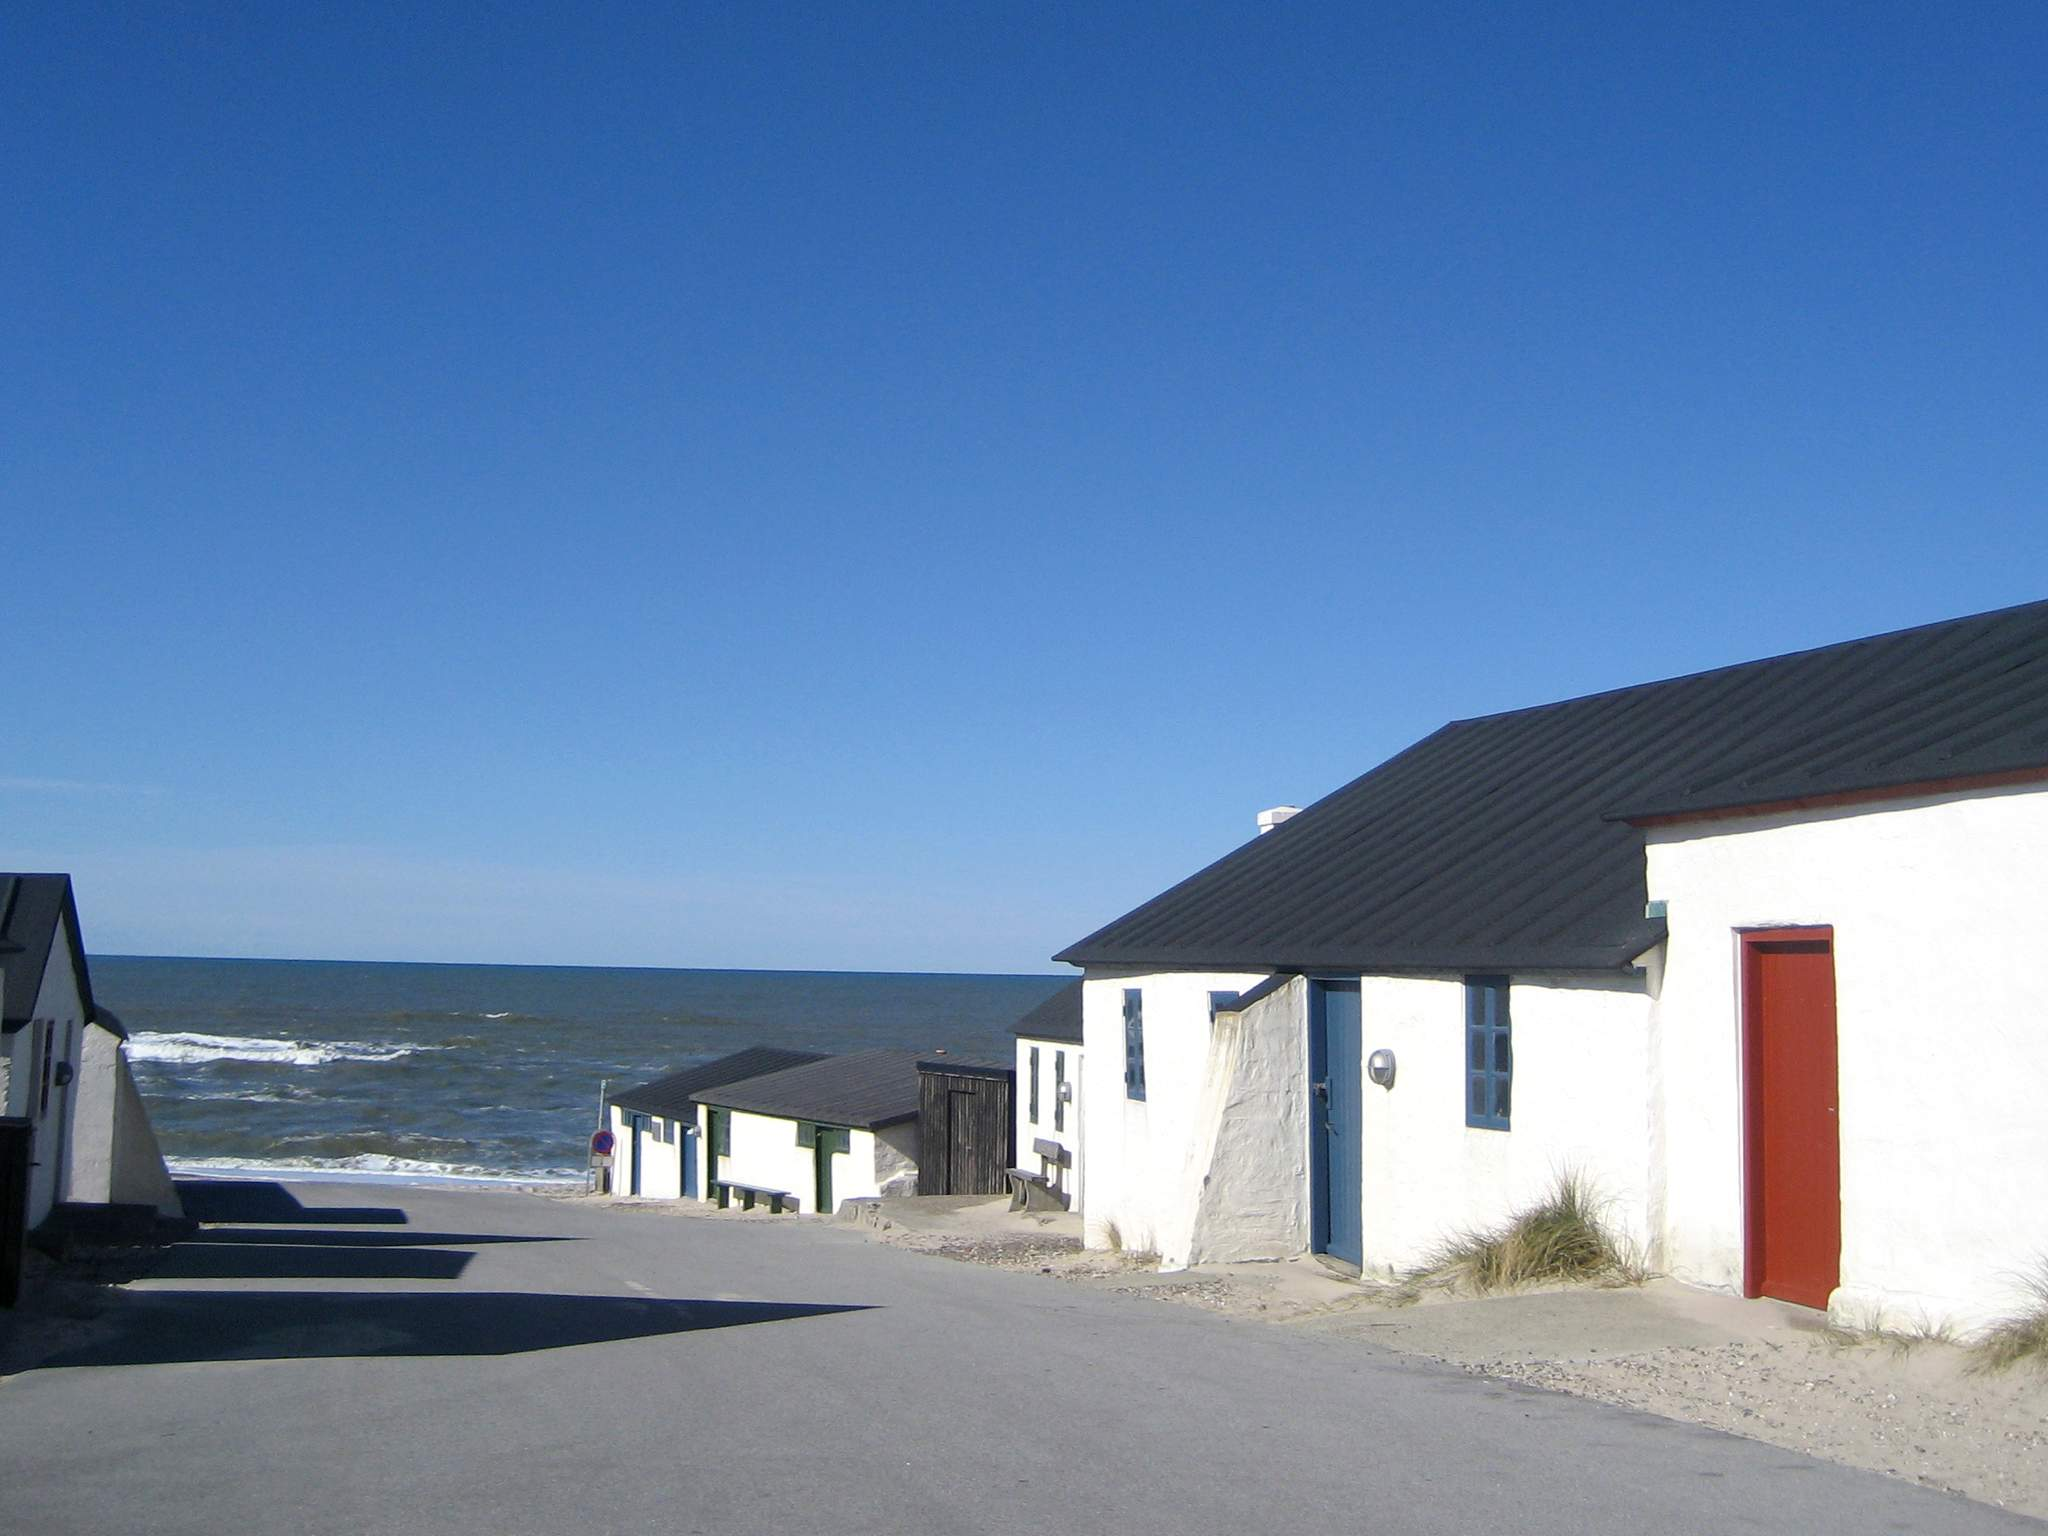 Ferienhaus Vorupør/Stenbjerg (84574), Snedsted, , Limfjord, Dänemark, Bild 17